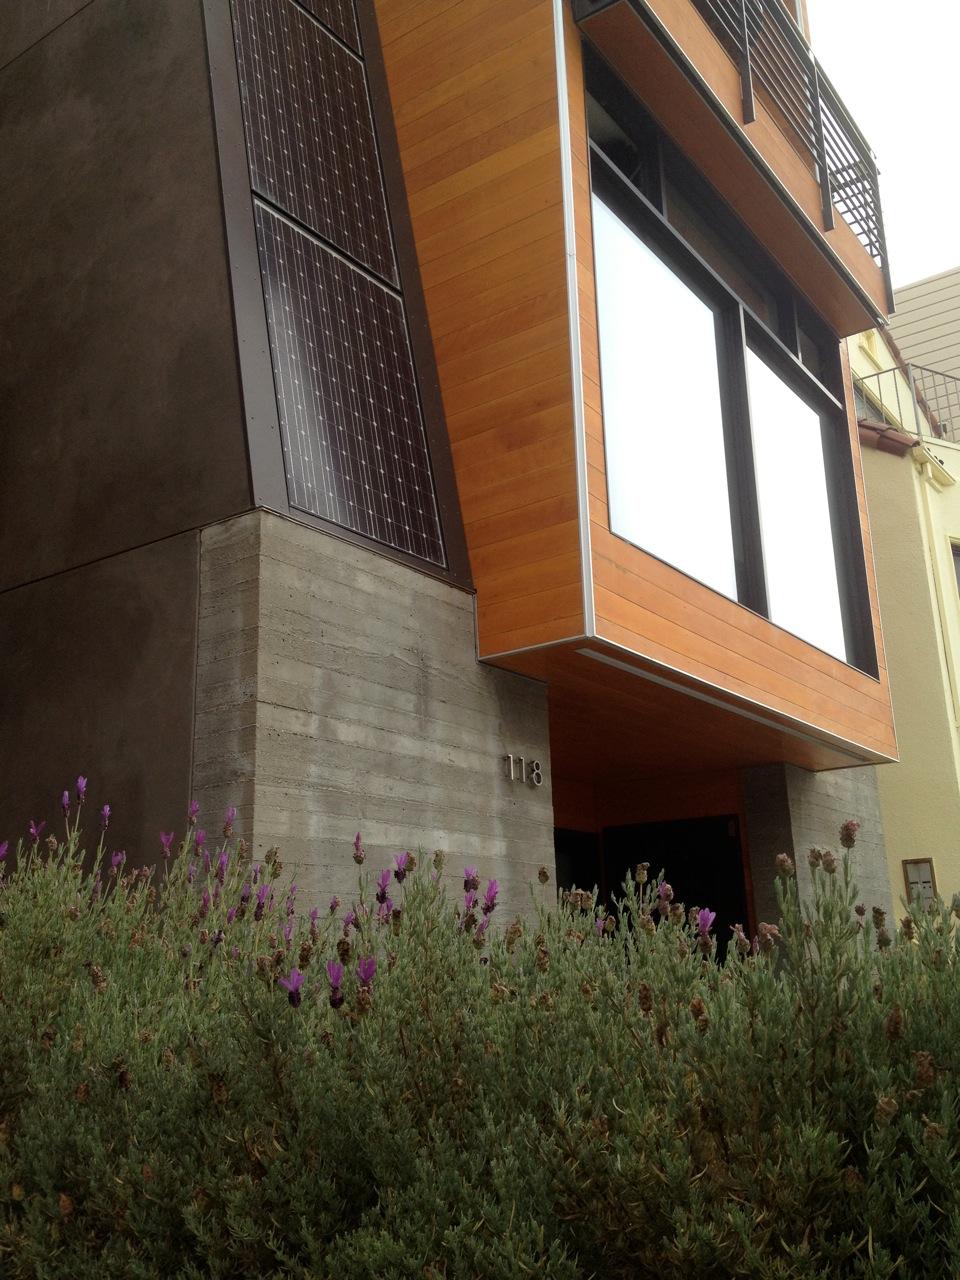 Lee front exterior detail4.jpg